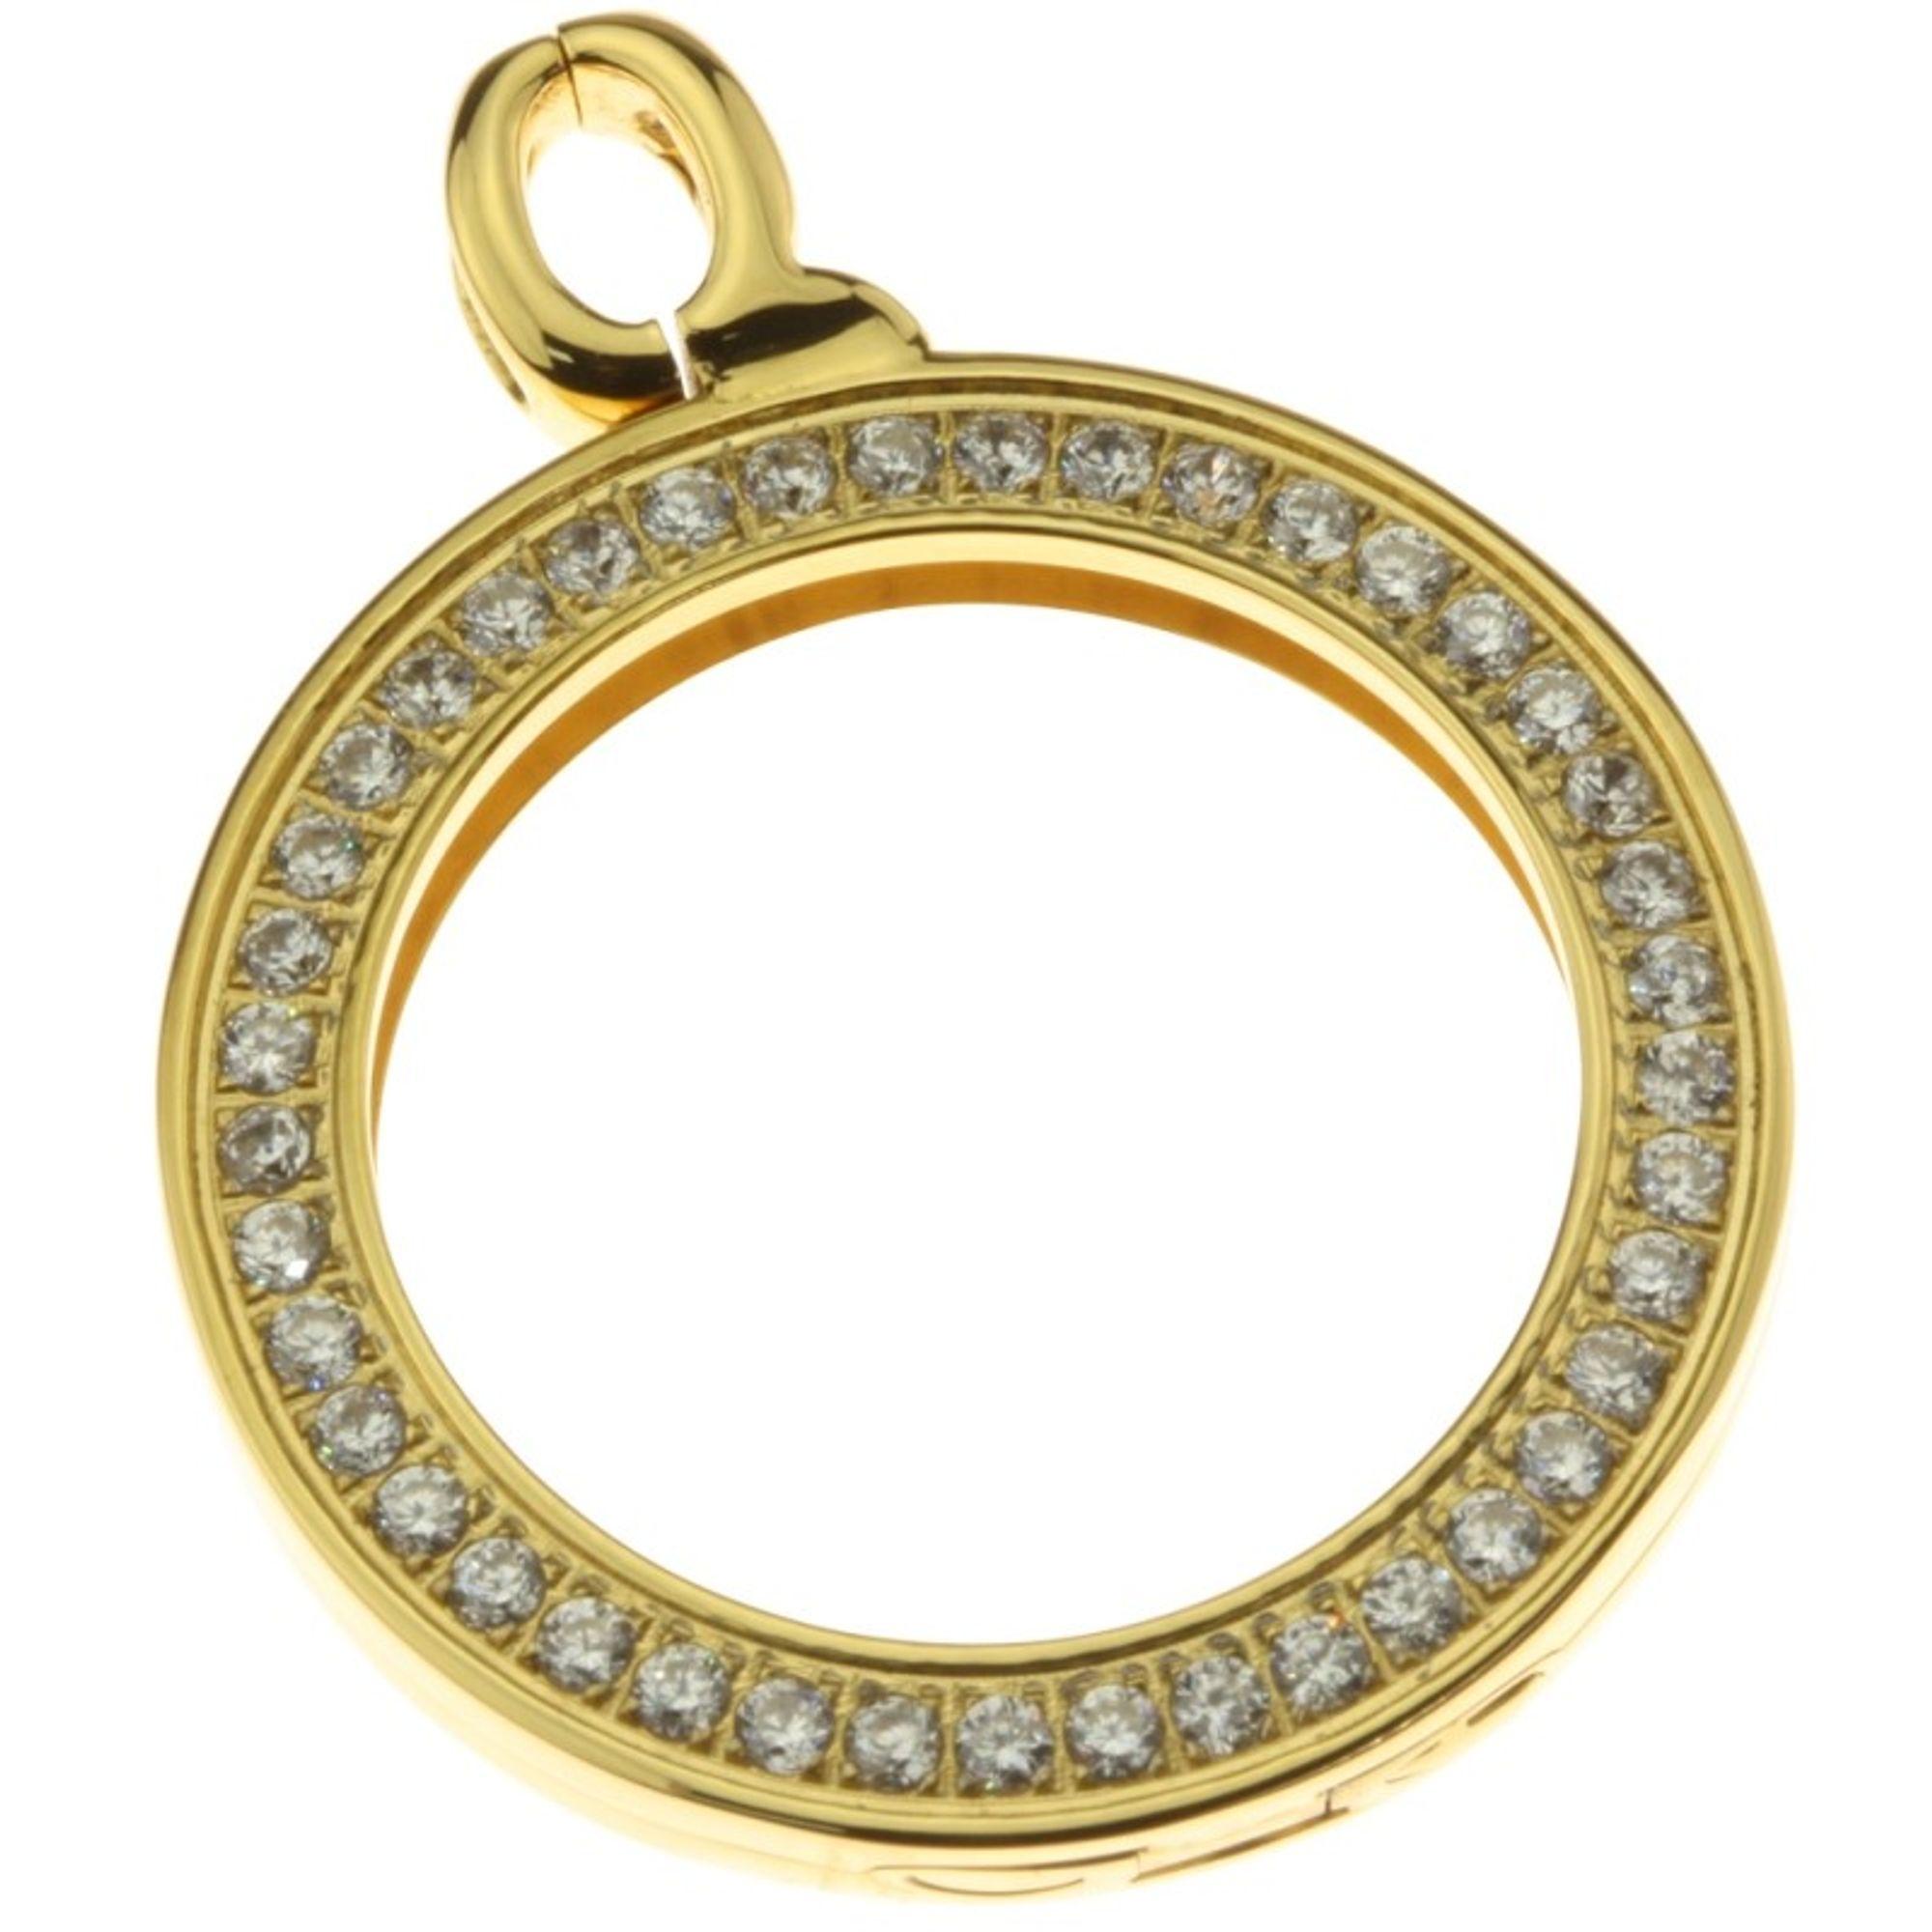 Quoins QHO-16L-G Damen Anhänger Rahmen gold large Edelstahl